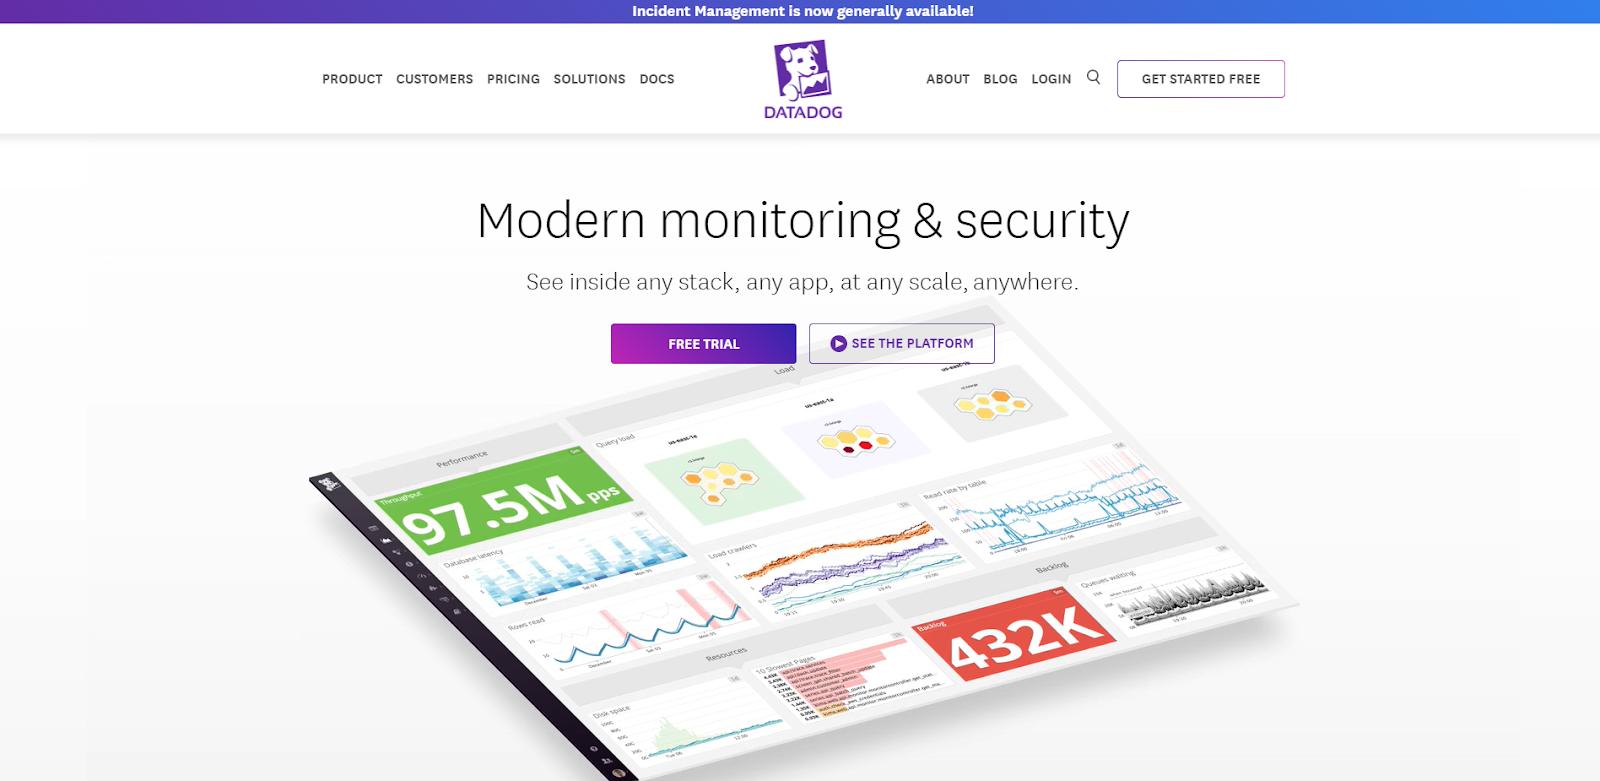 Datadog Network Monitoring Tool